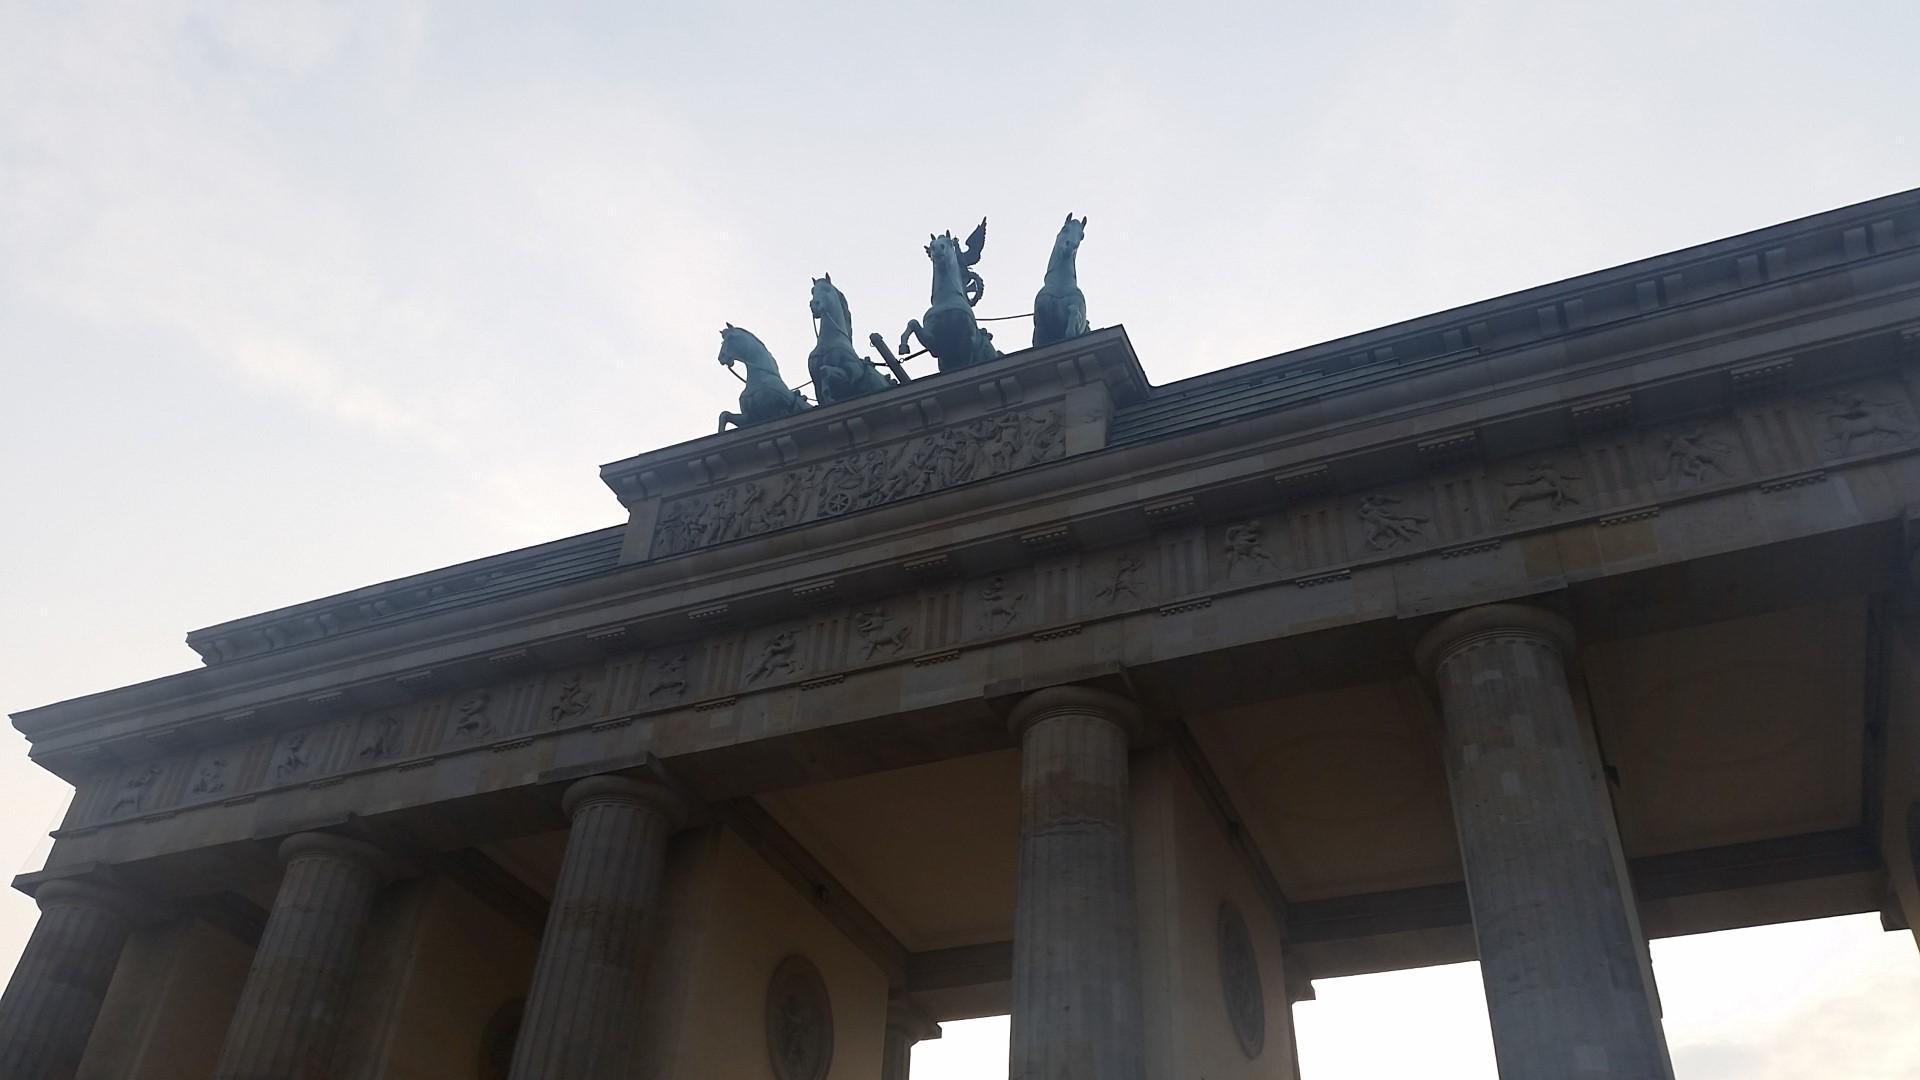 Berlin 2015  (2015-03-17)